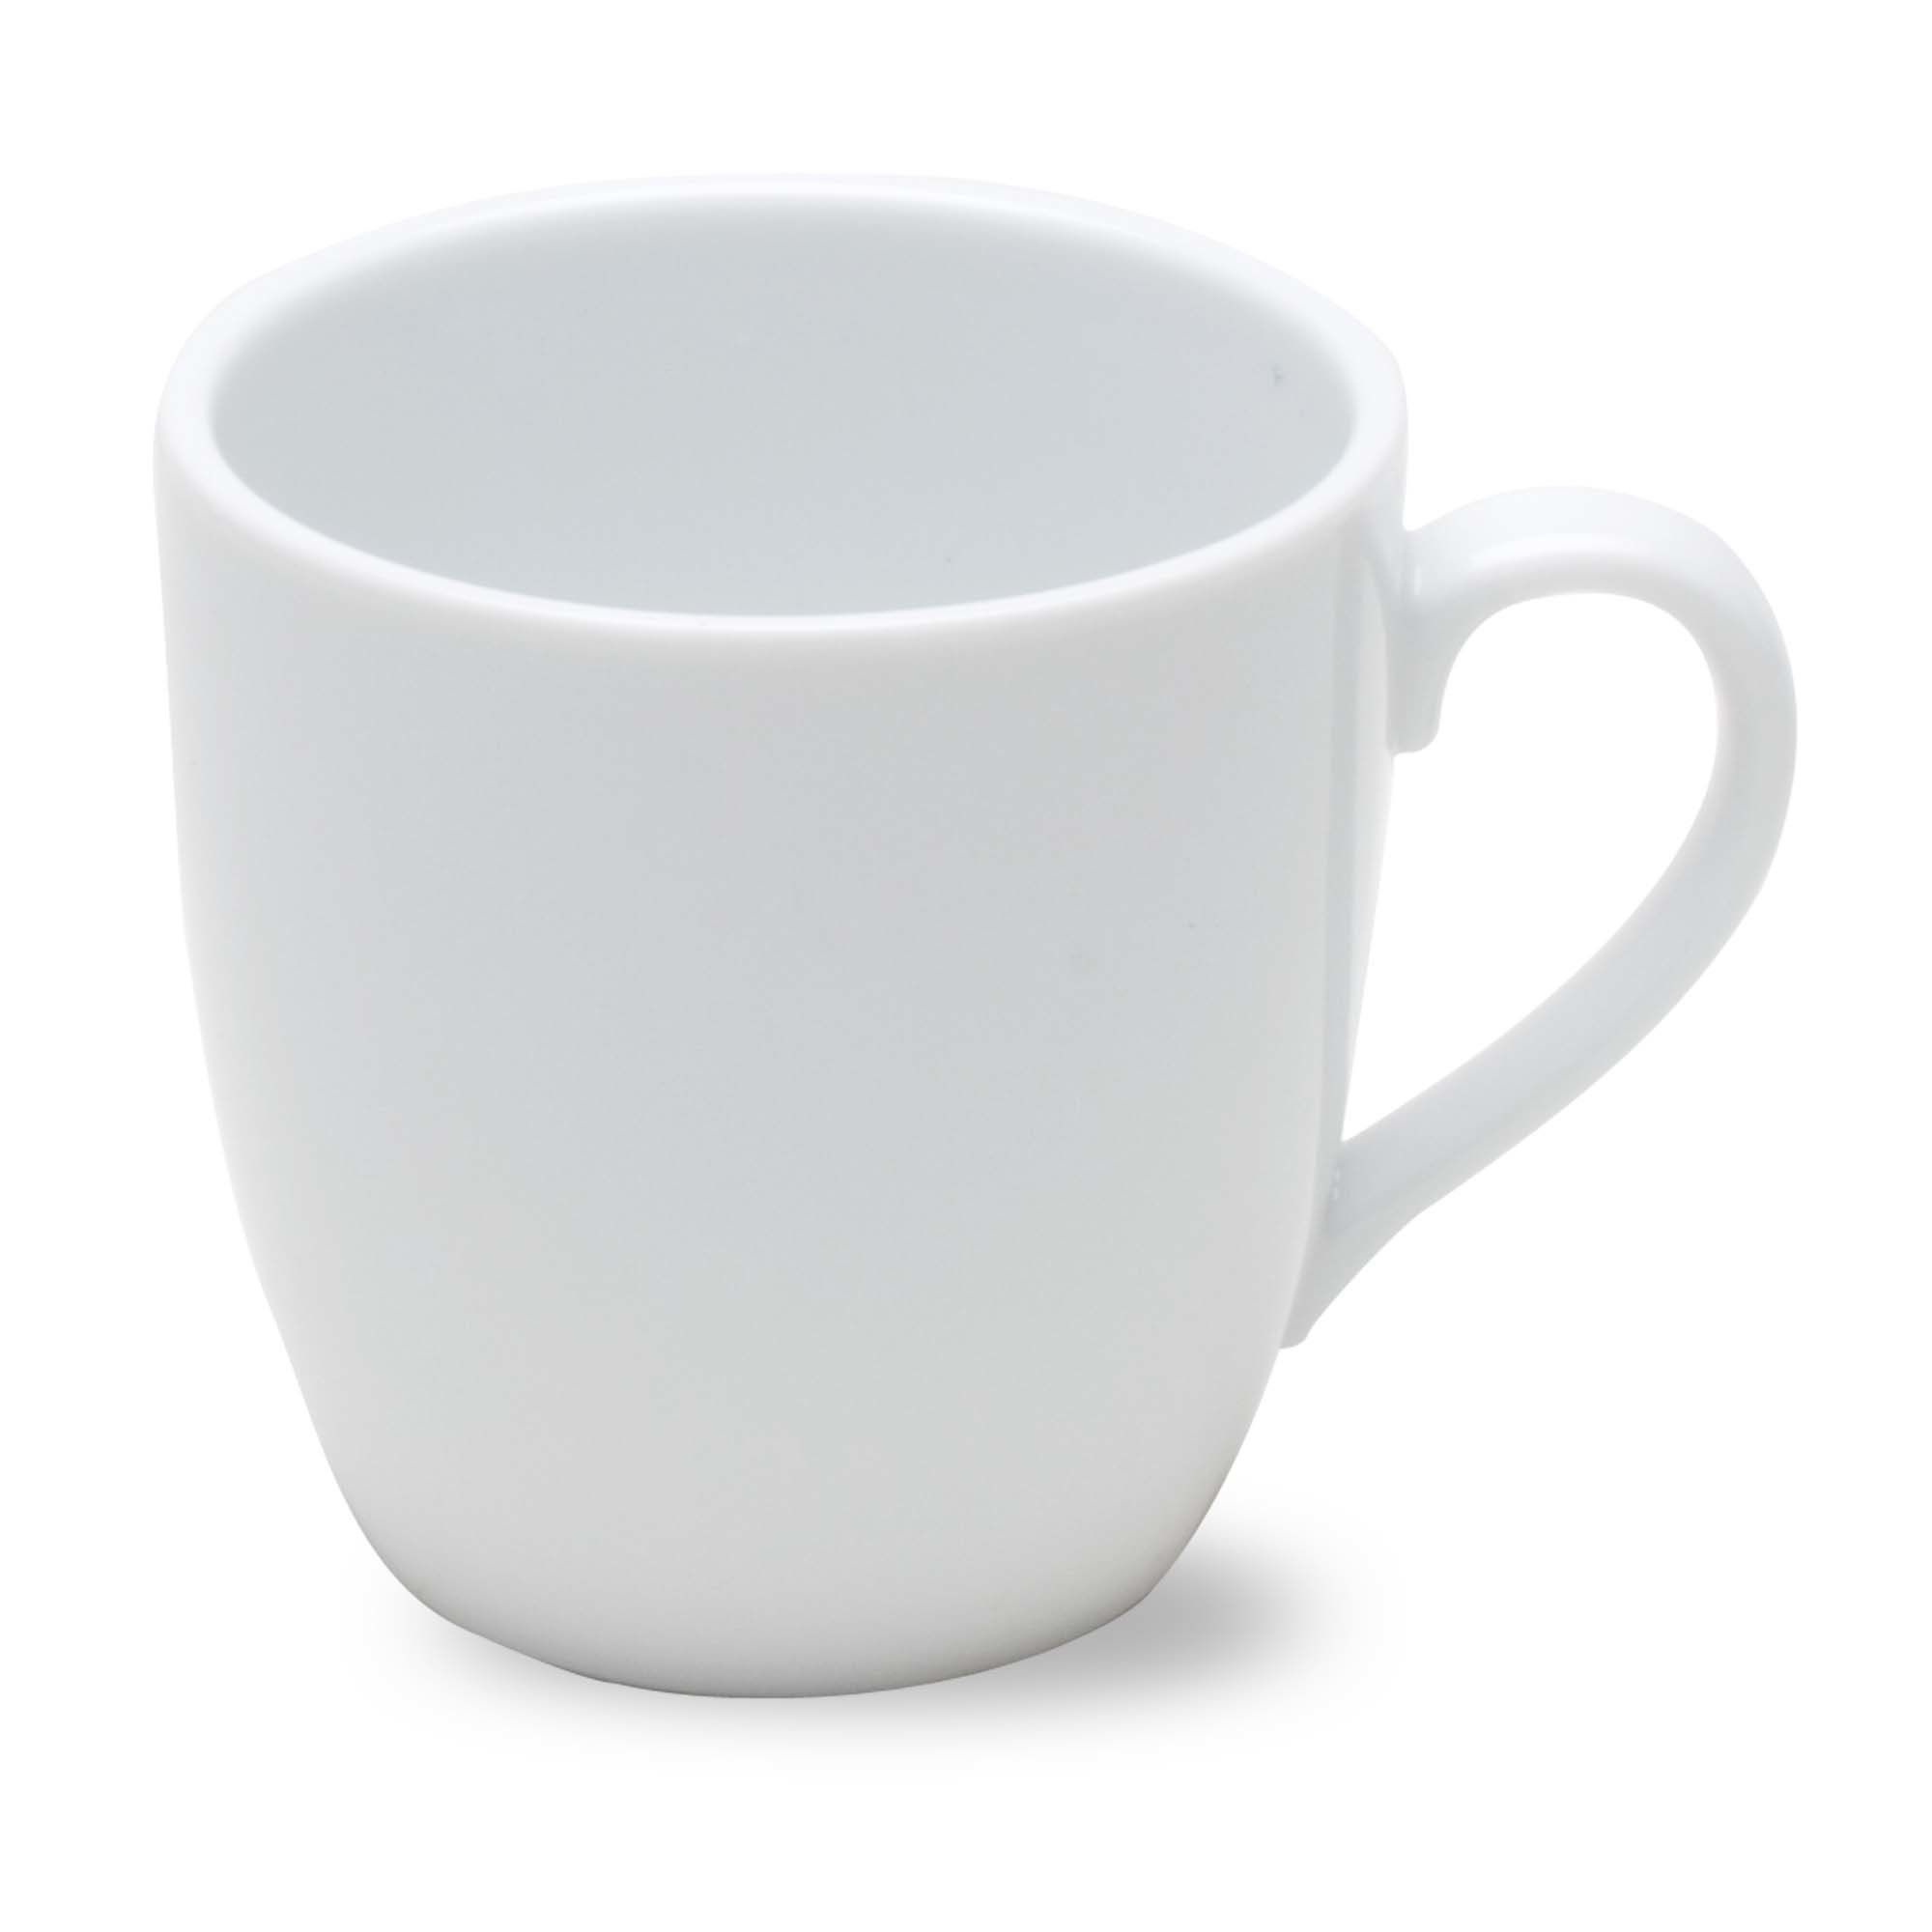 Whiteware Curved Cappuccino Mug